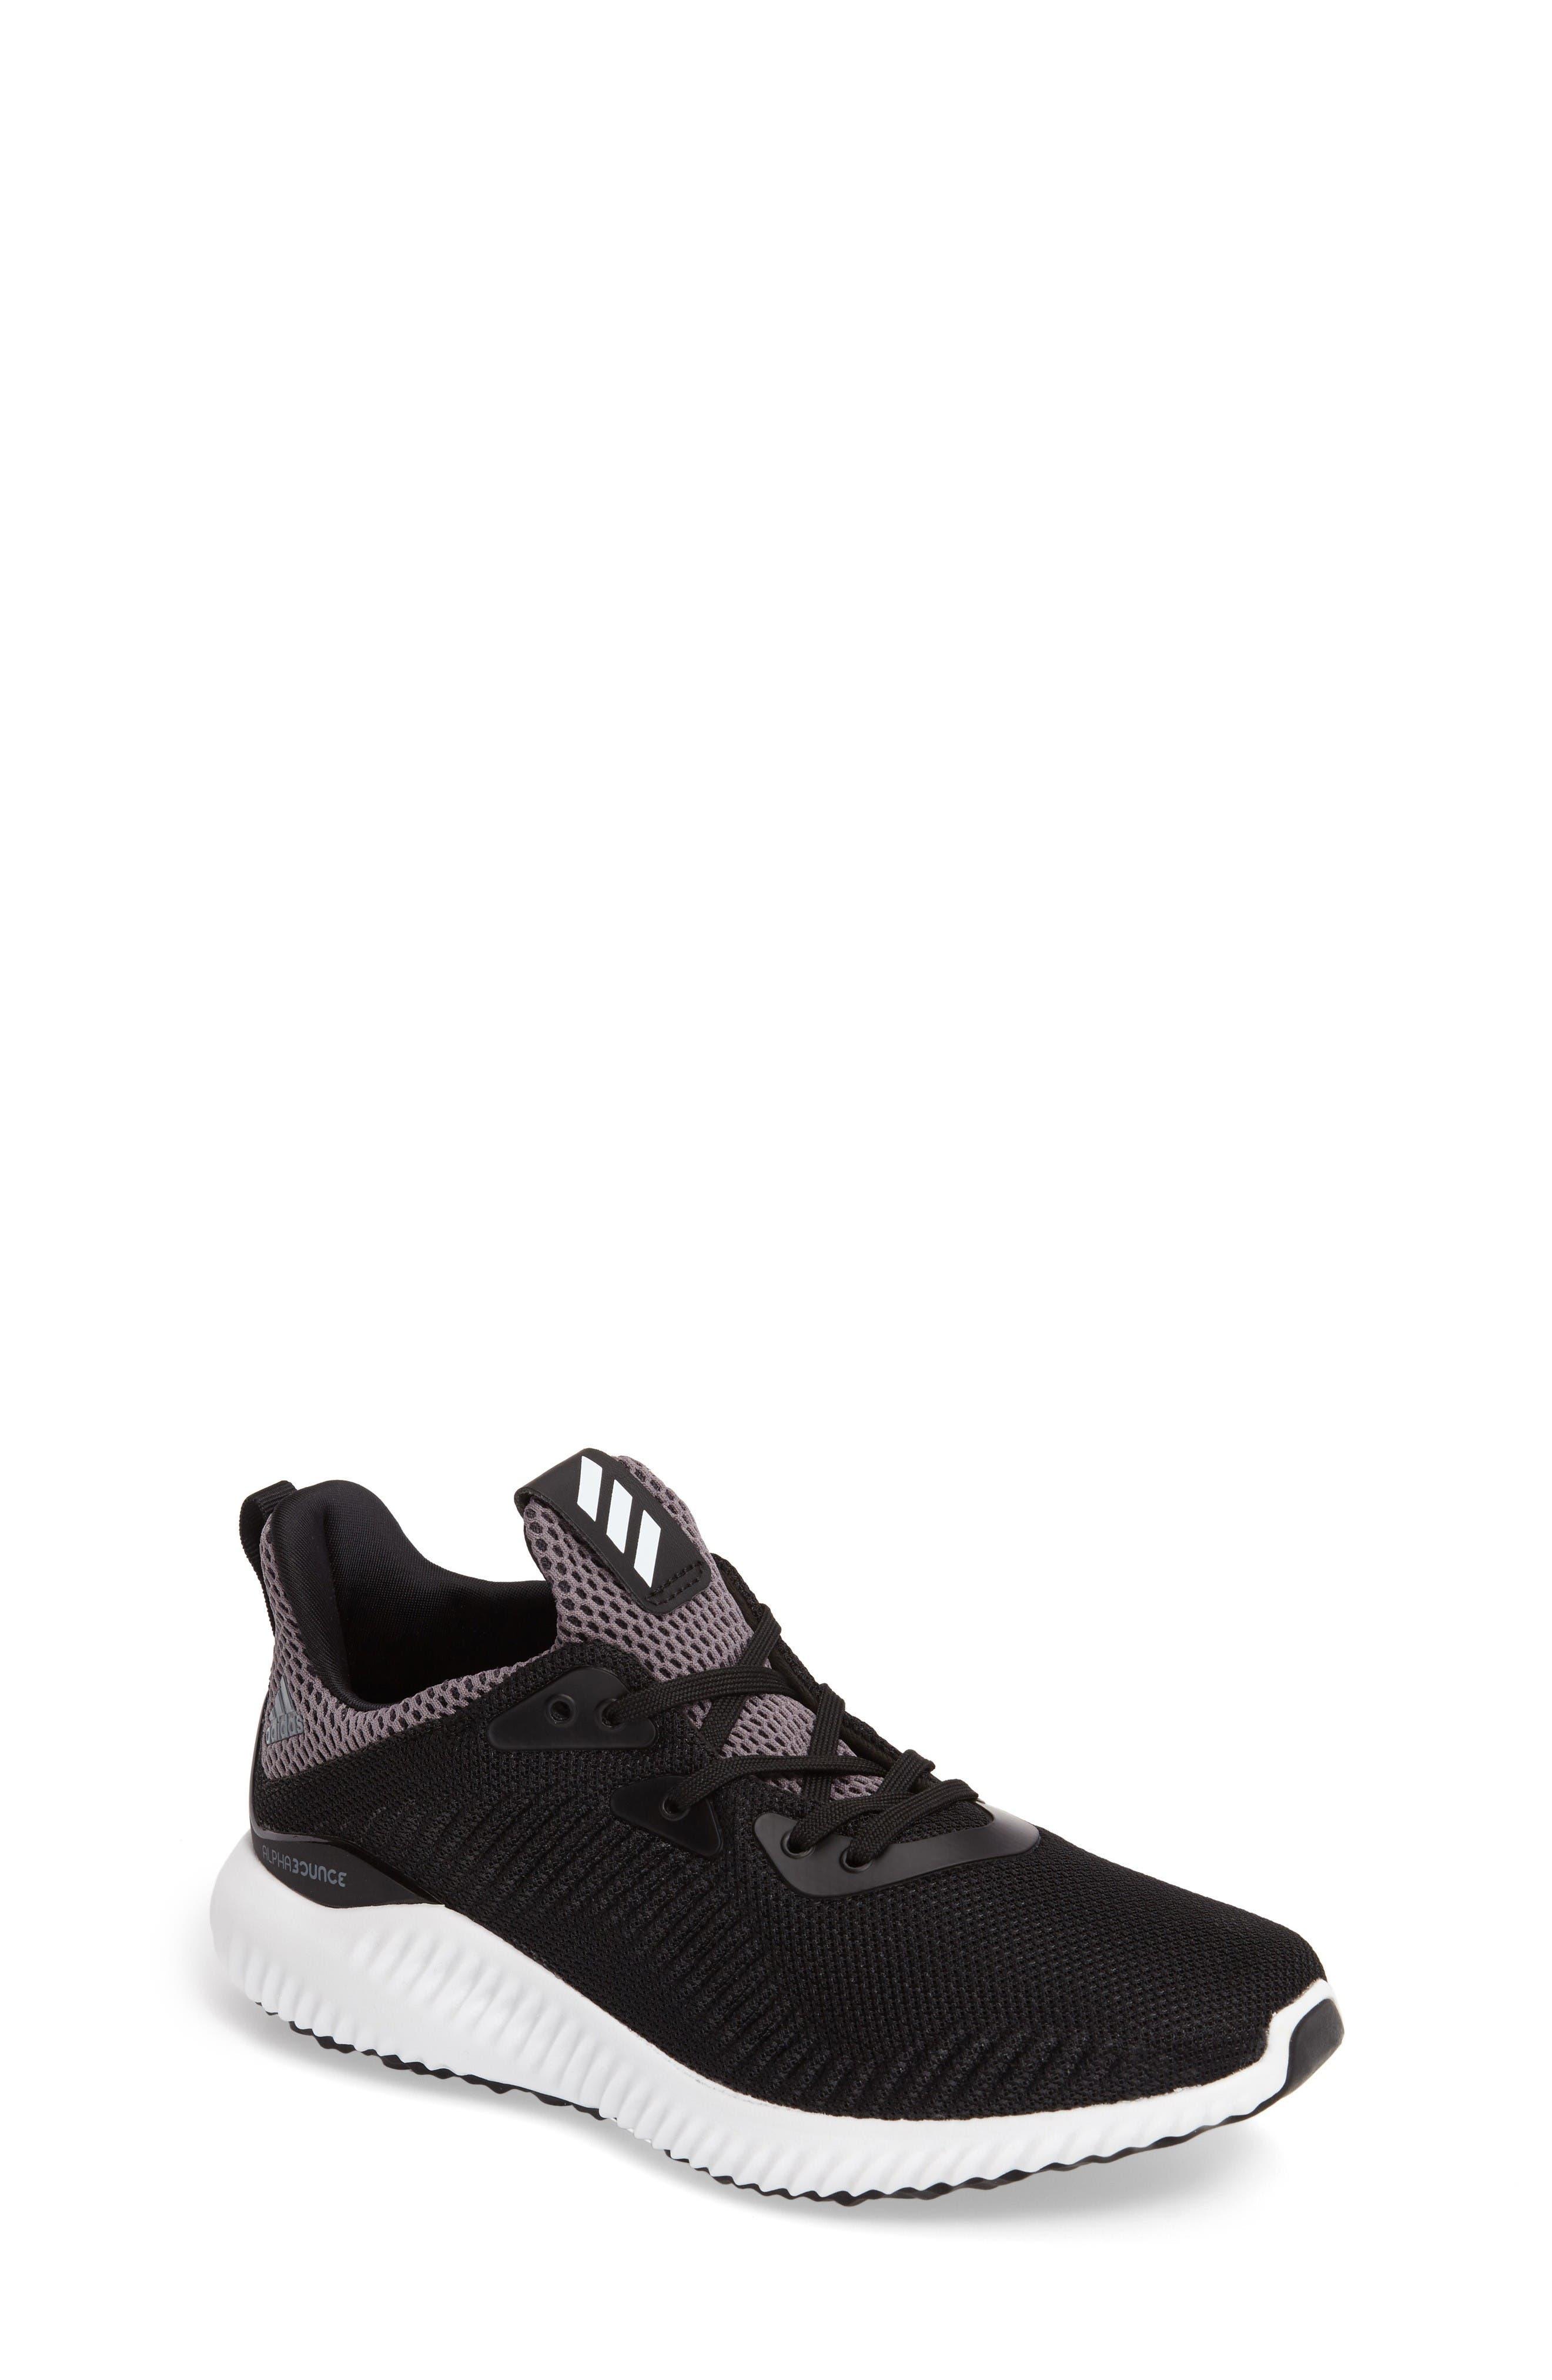 adidas AlphaBOUNCE Sneaker (Toddler, Little Kid & Big Kid)